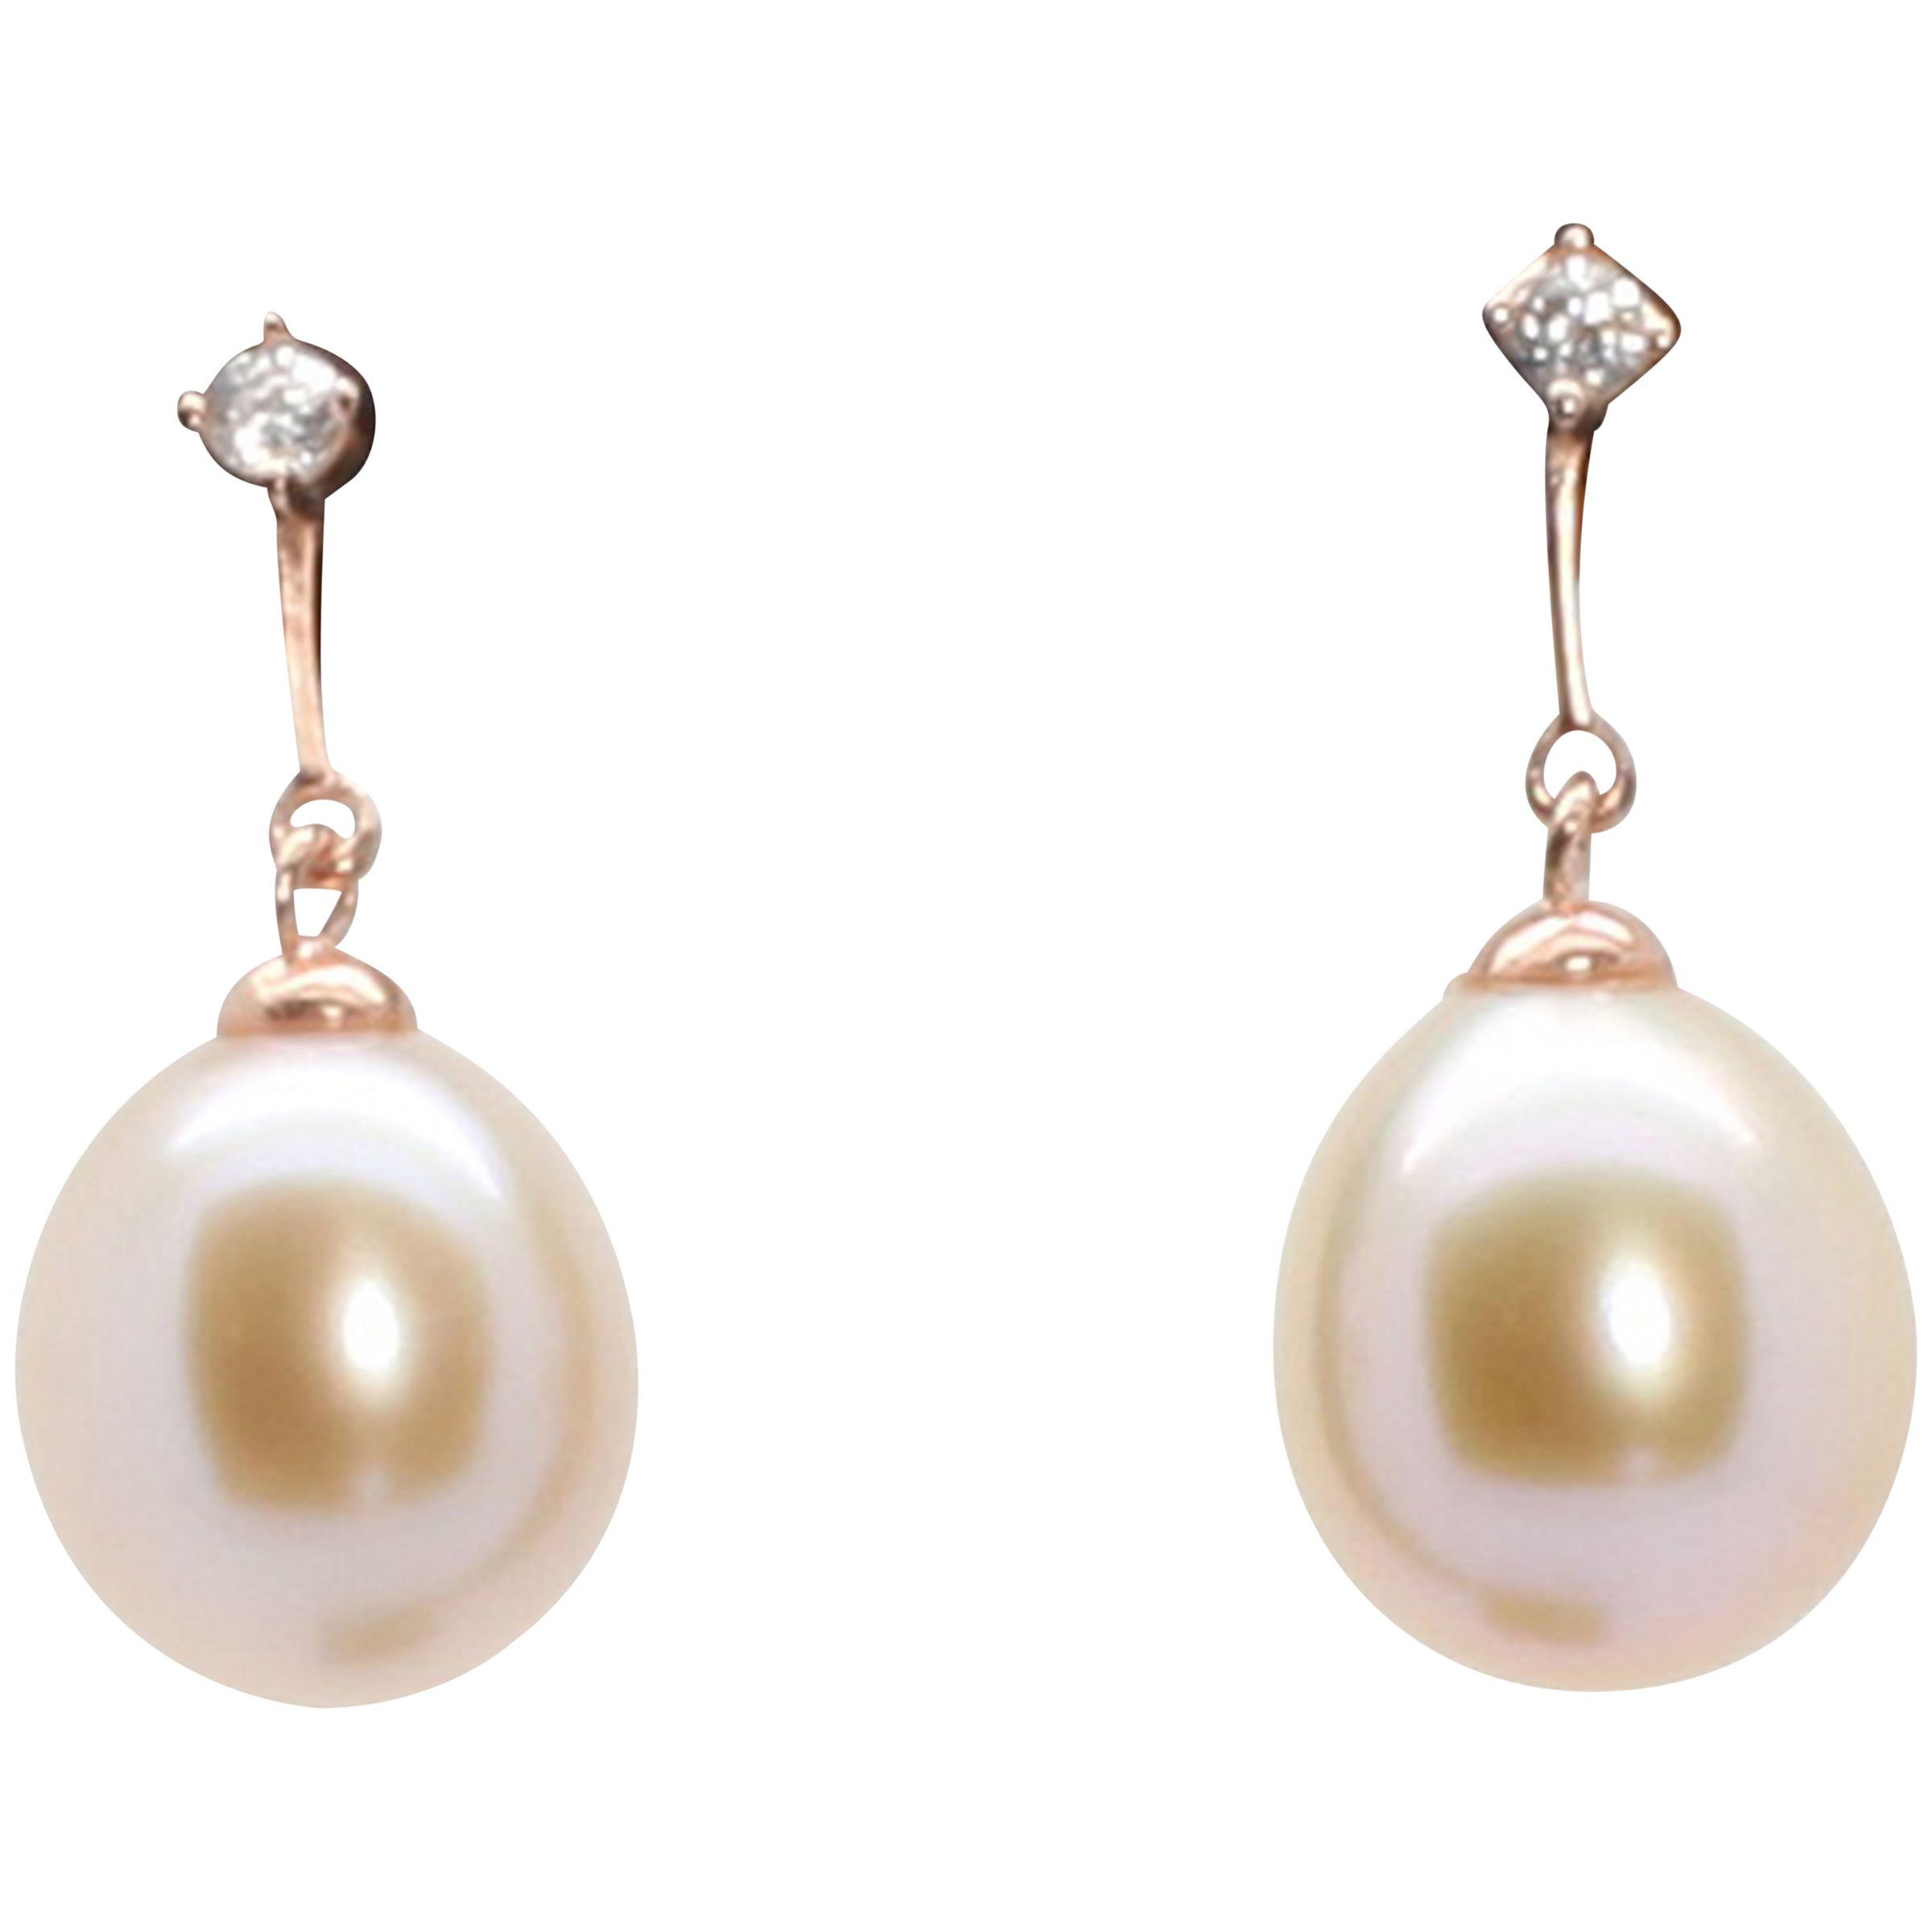 Lido Pearls Lido Pearls Oval Rice Freshwater Pearl Cubic Zirconia Stud Drop Earrings